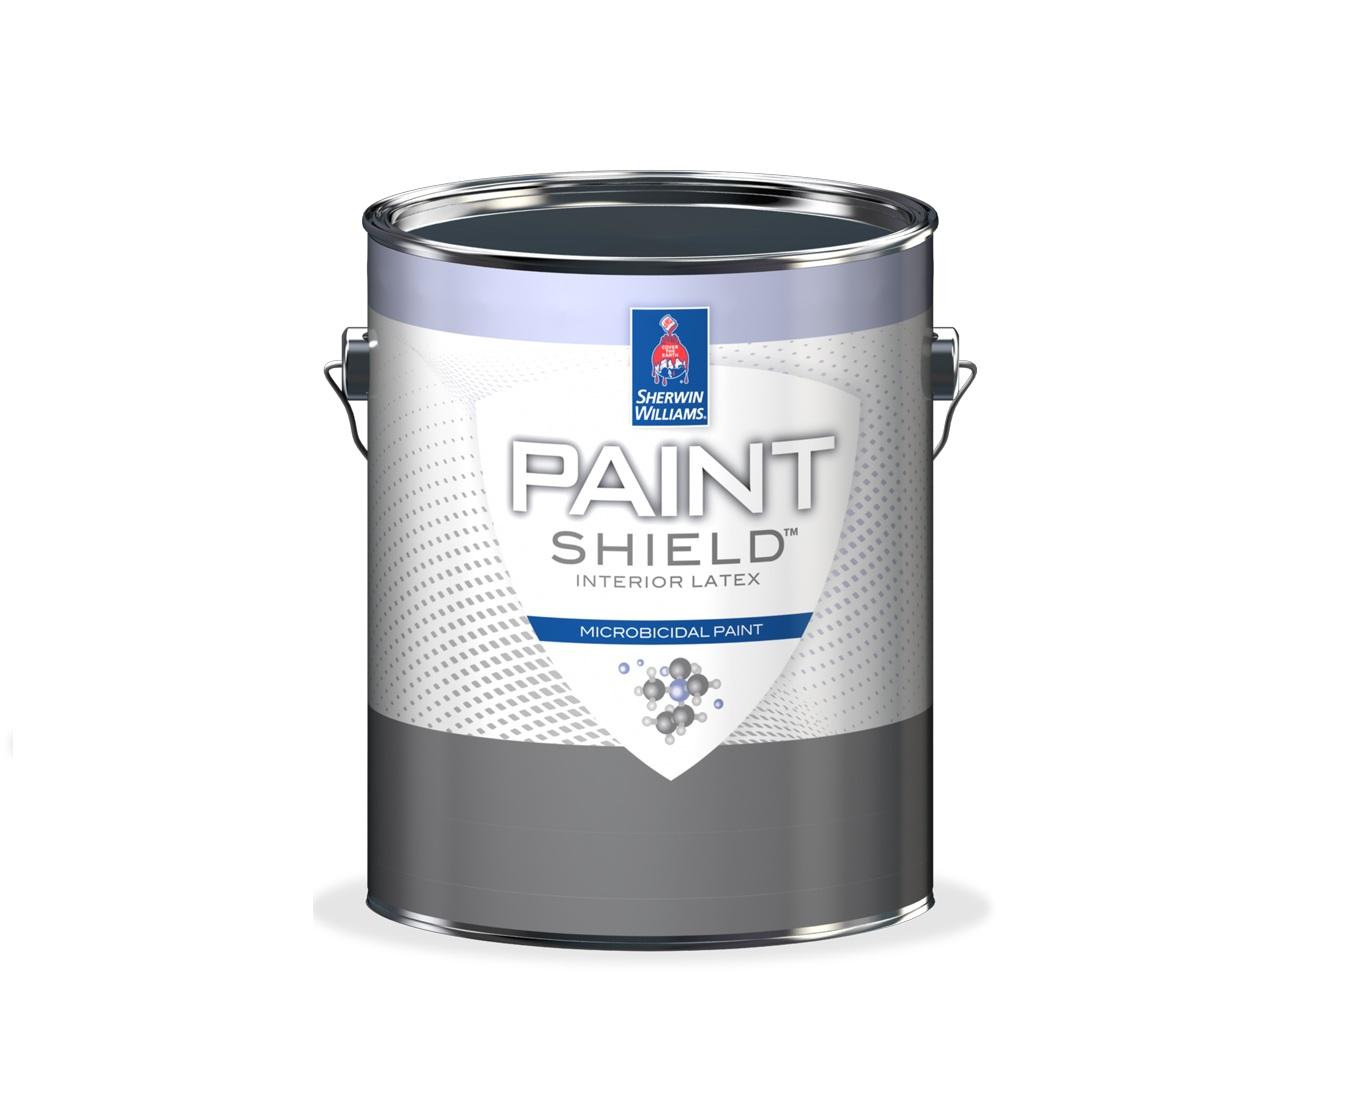 Sơn Paint Shield của Sherwin Williams